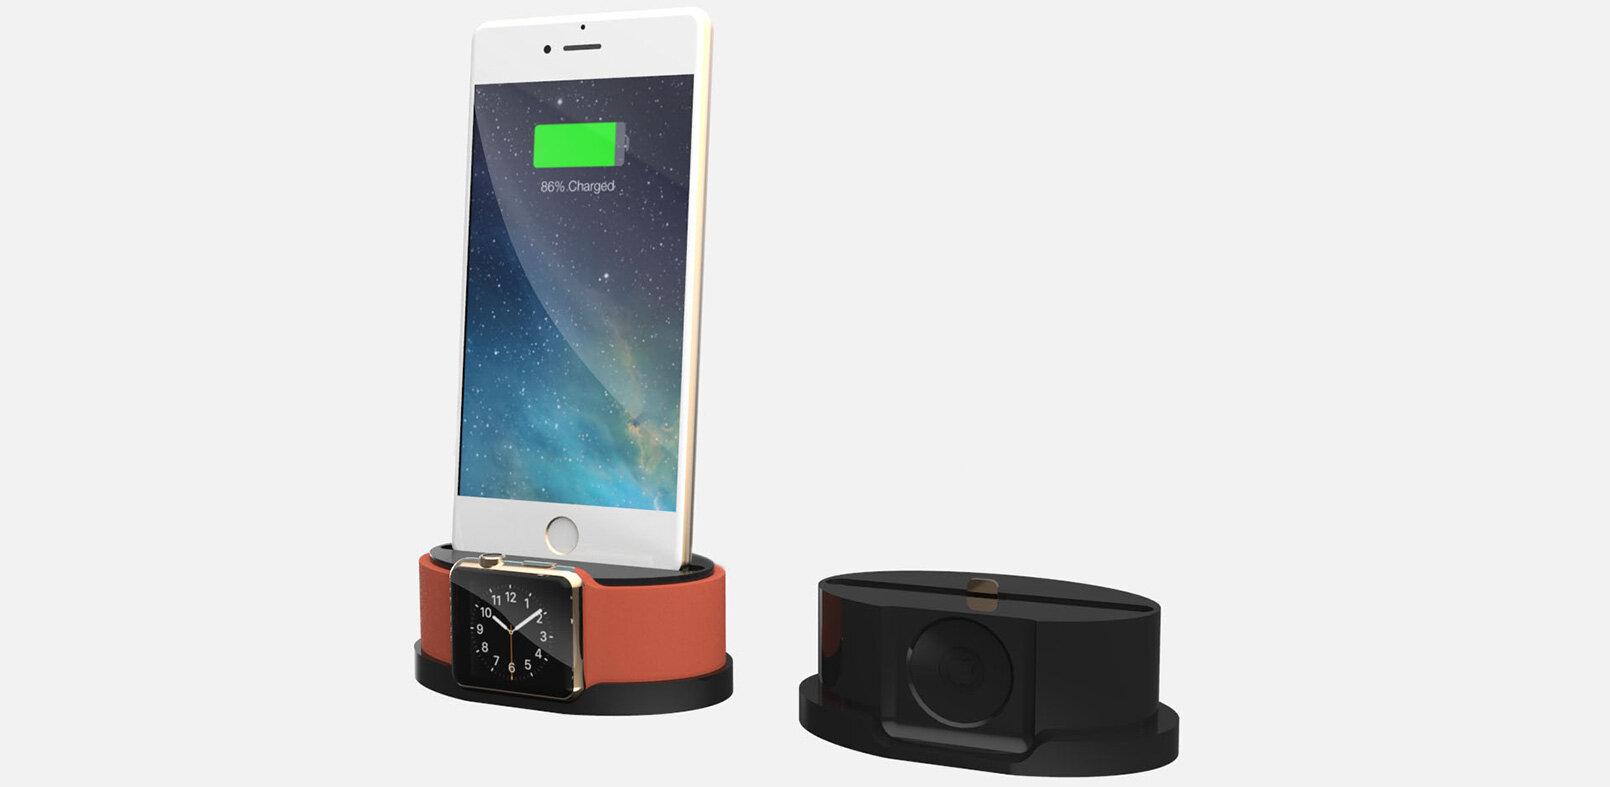 Apple-Watch-Smartwatch-Packaging-Design-Iwatch-Indable-Technology-5.jpg